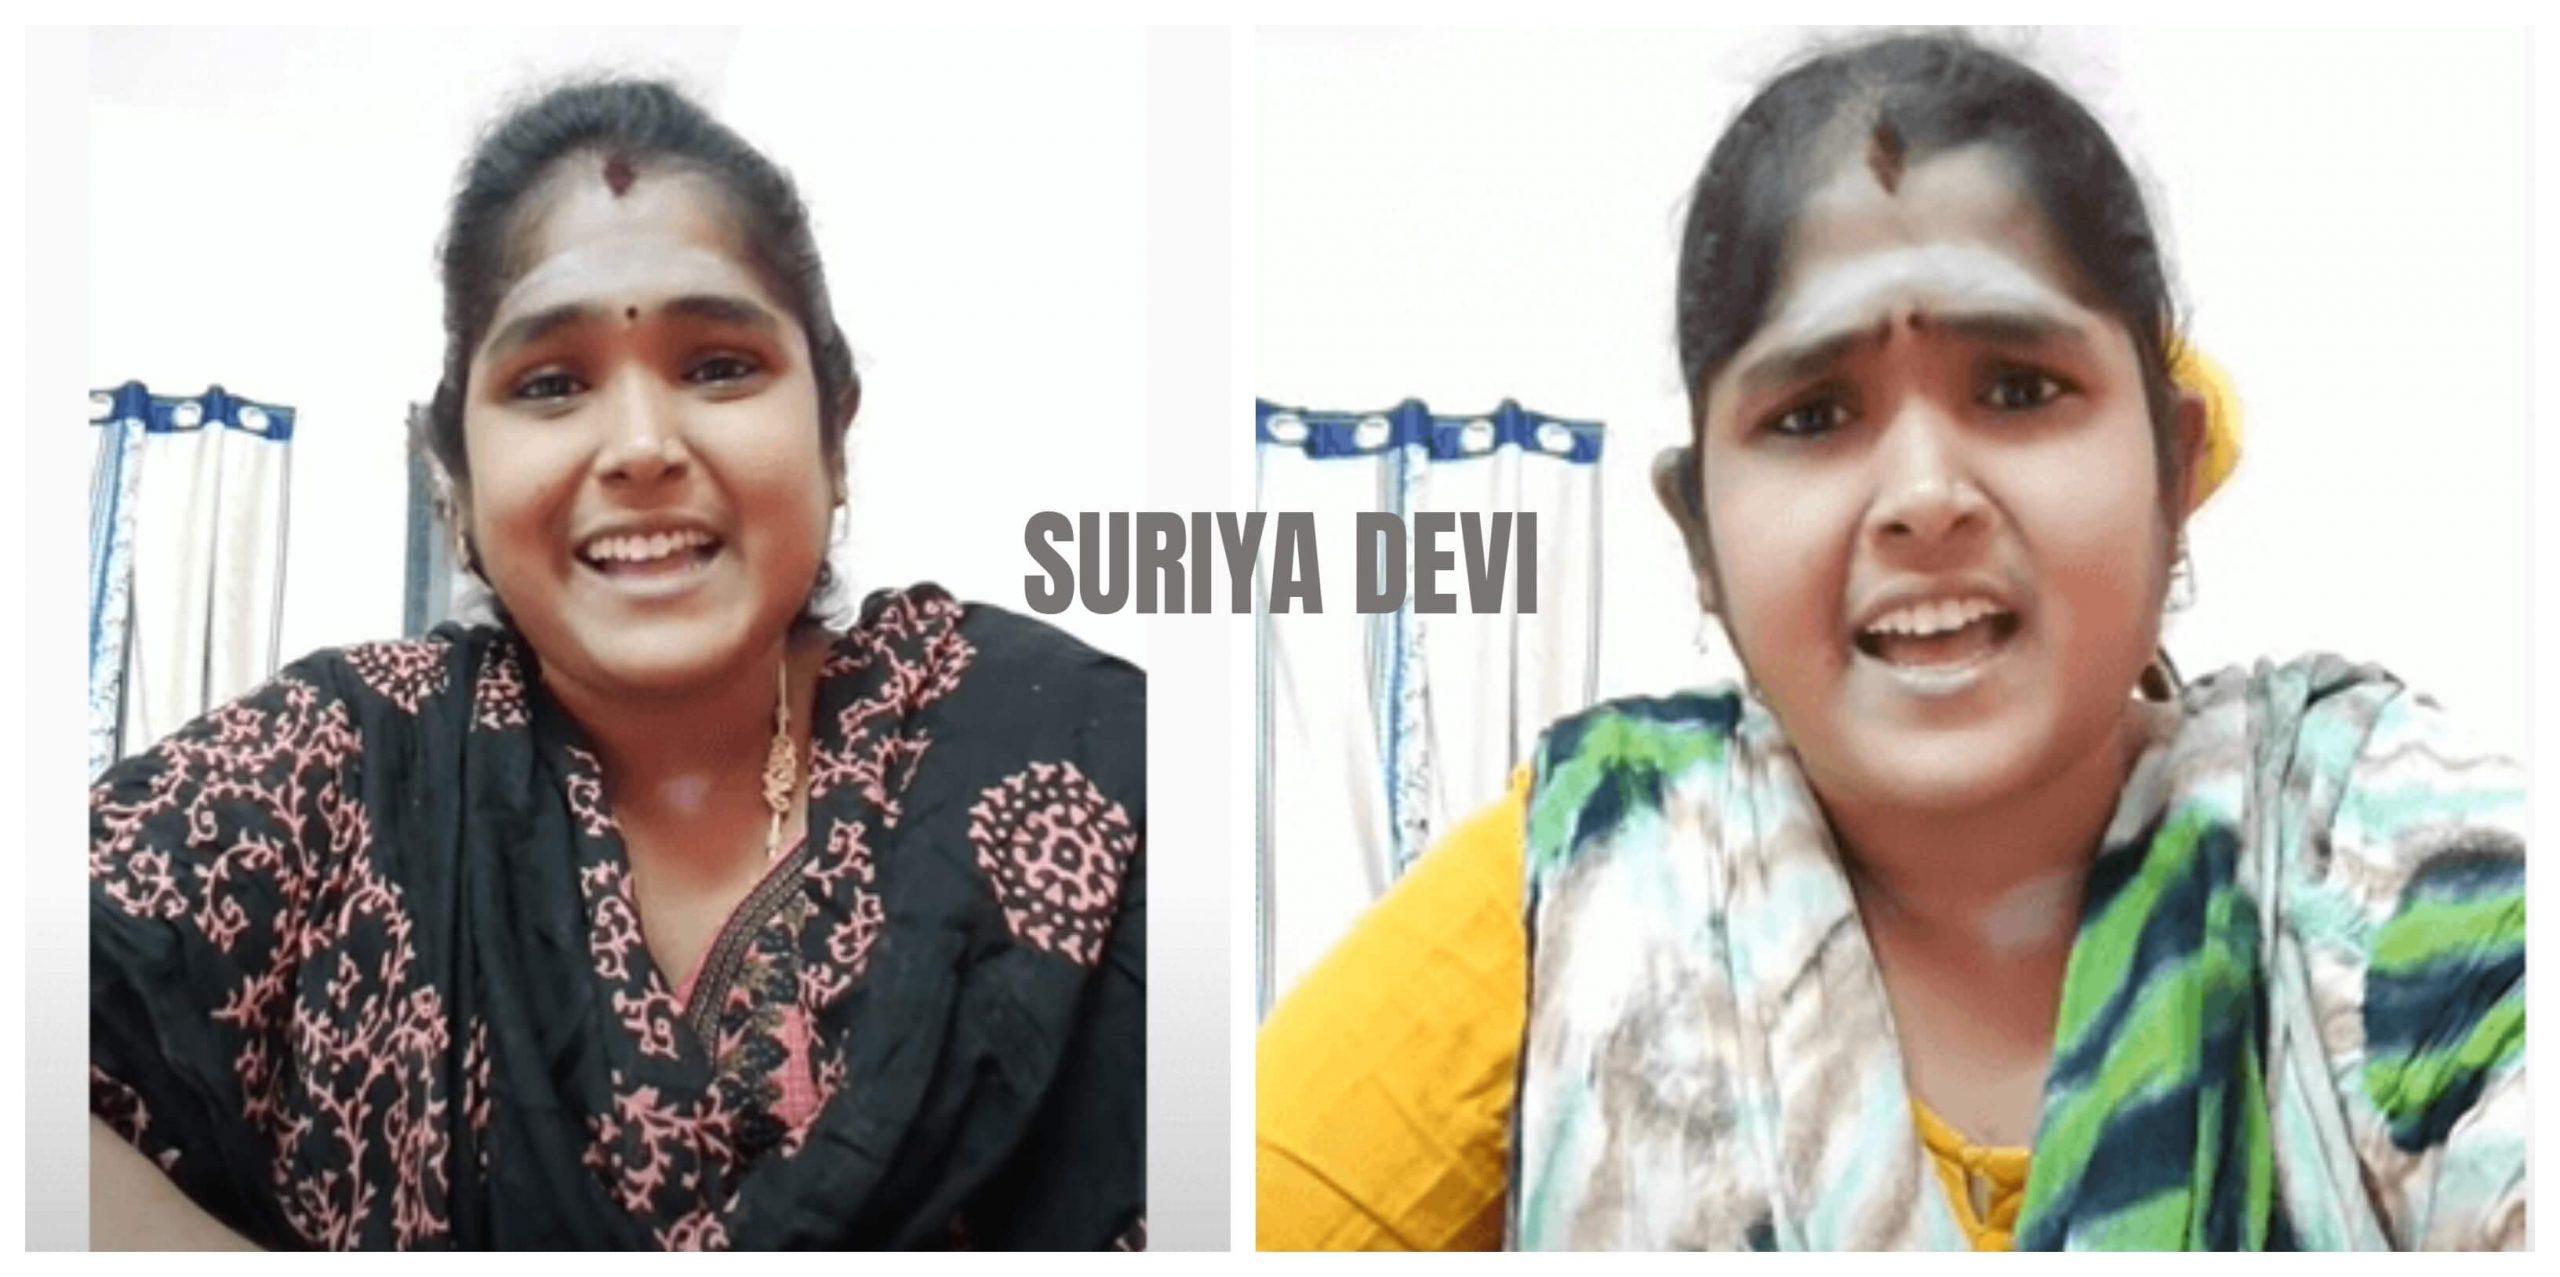 Suriya-Devi